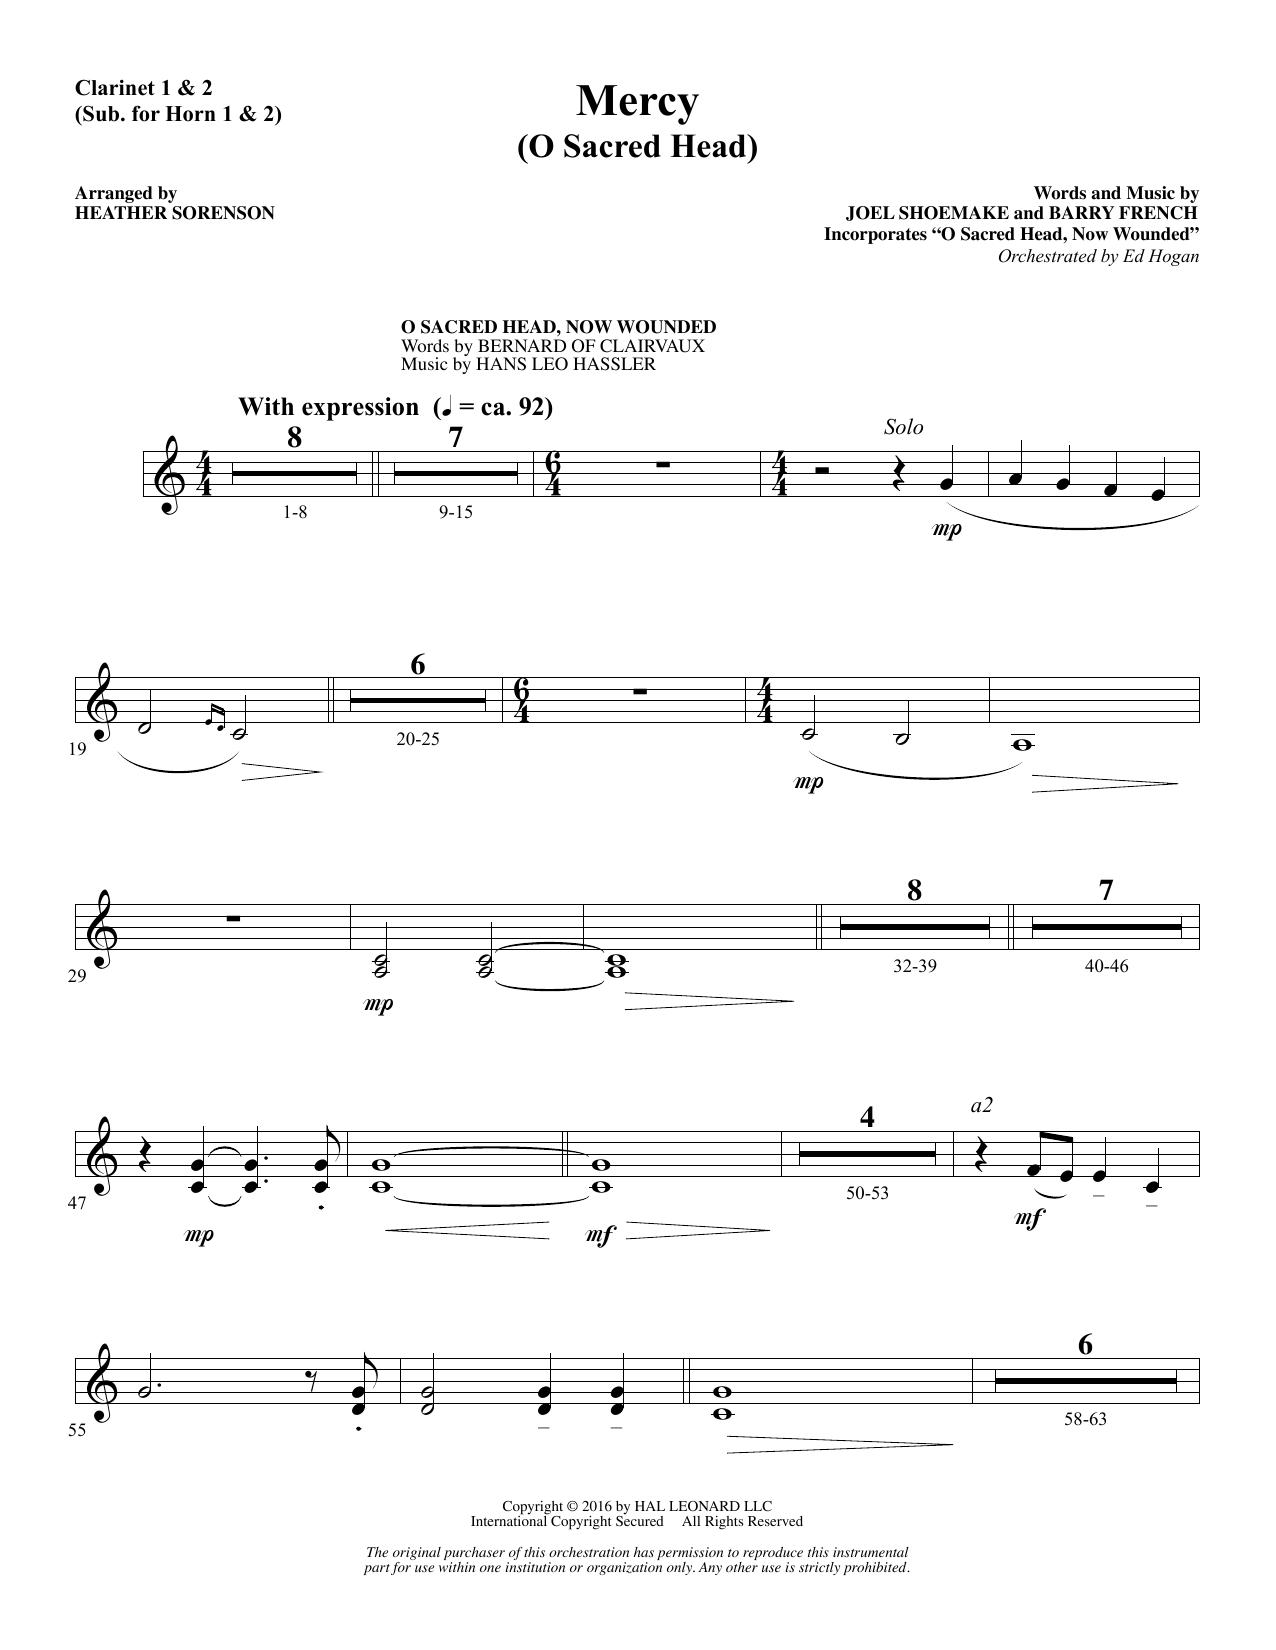 Mercy (O Sacred Head) - Clarinet (sub. Horn 1-2) Sheet Music